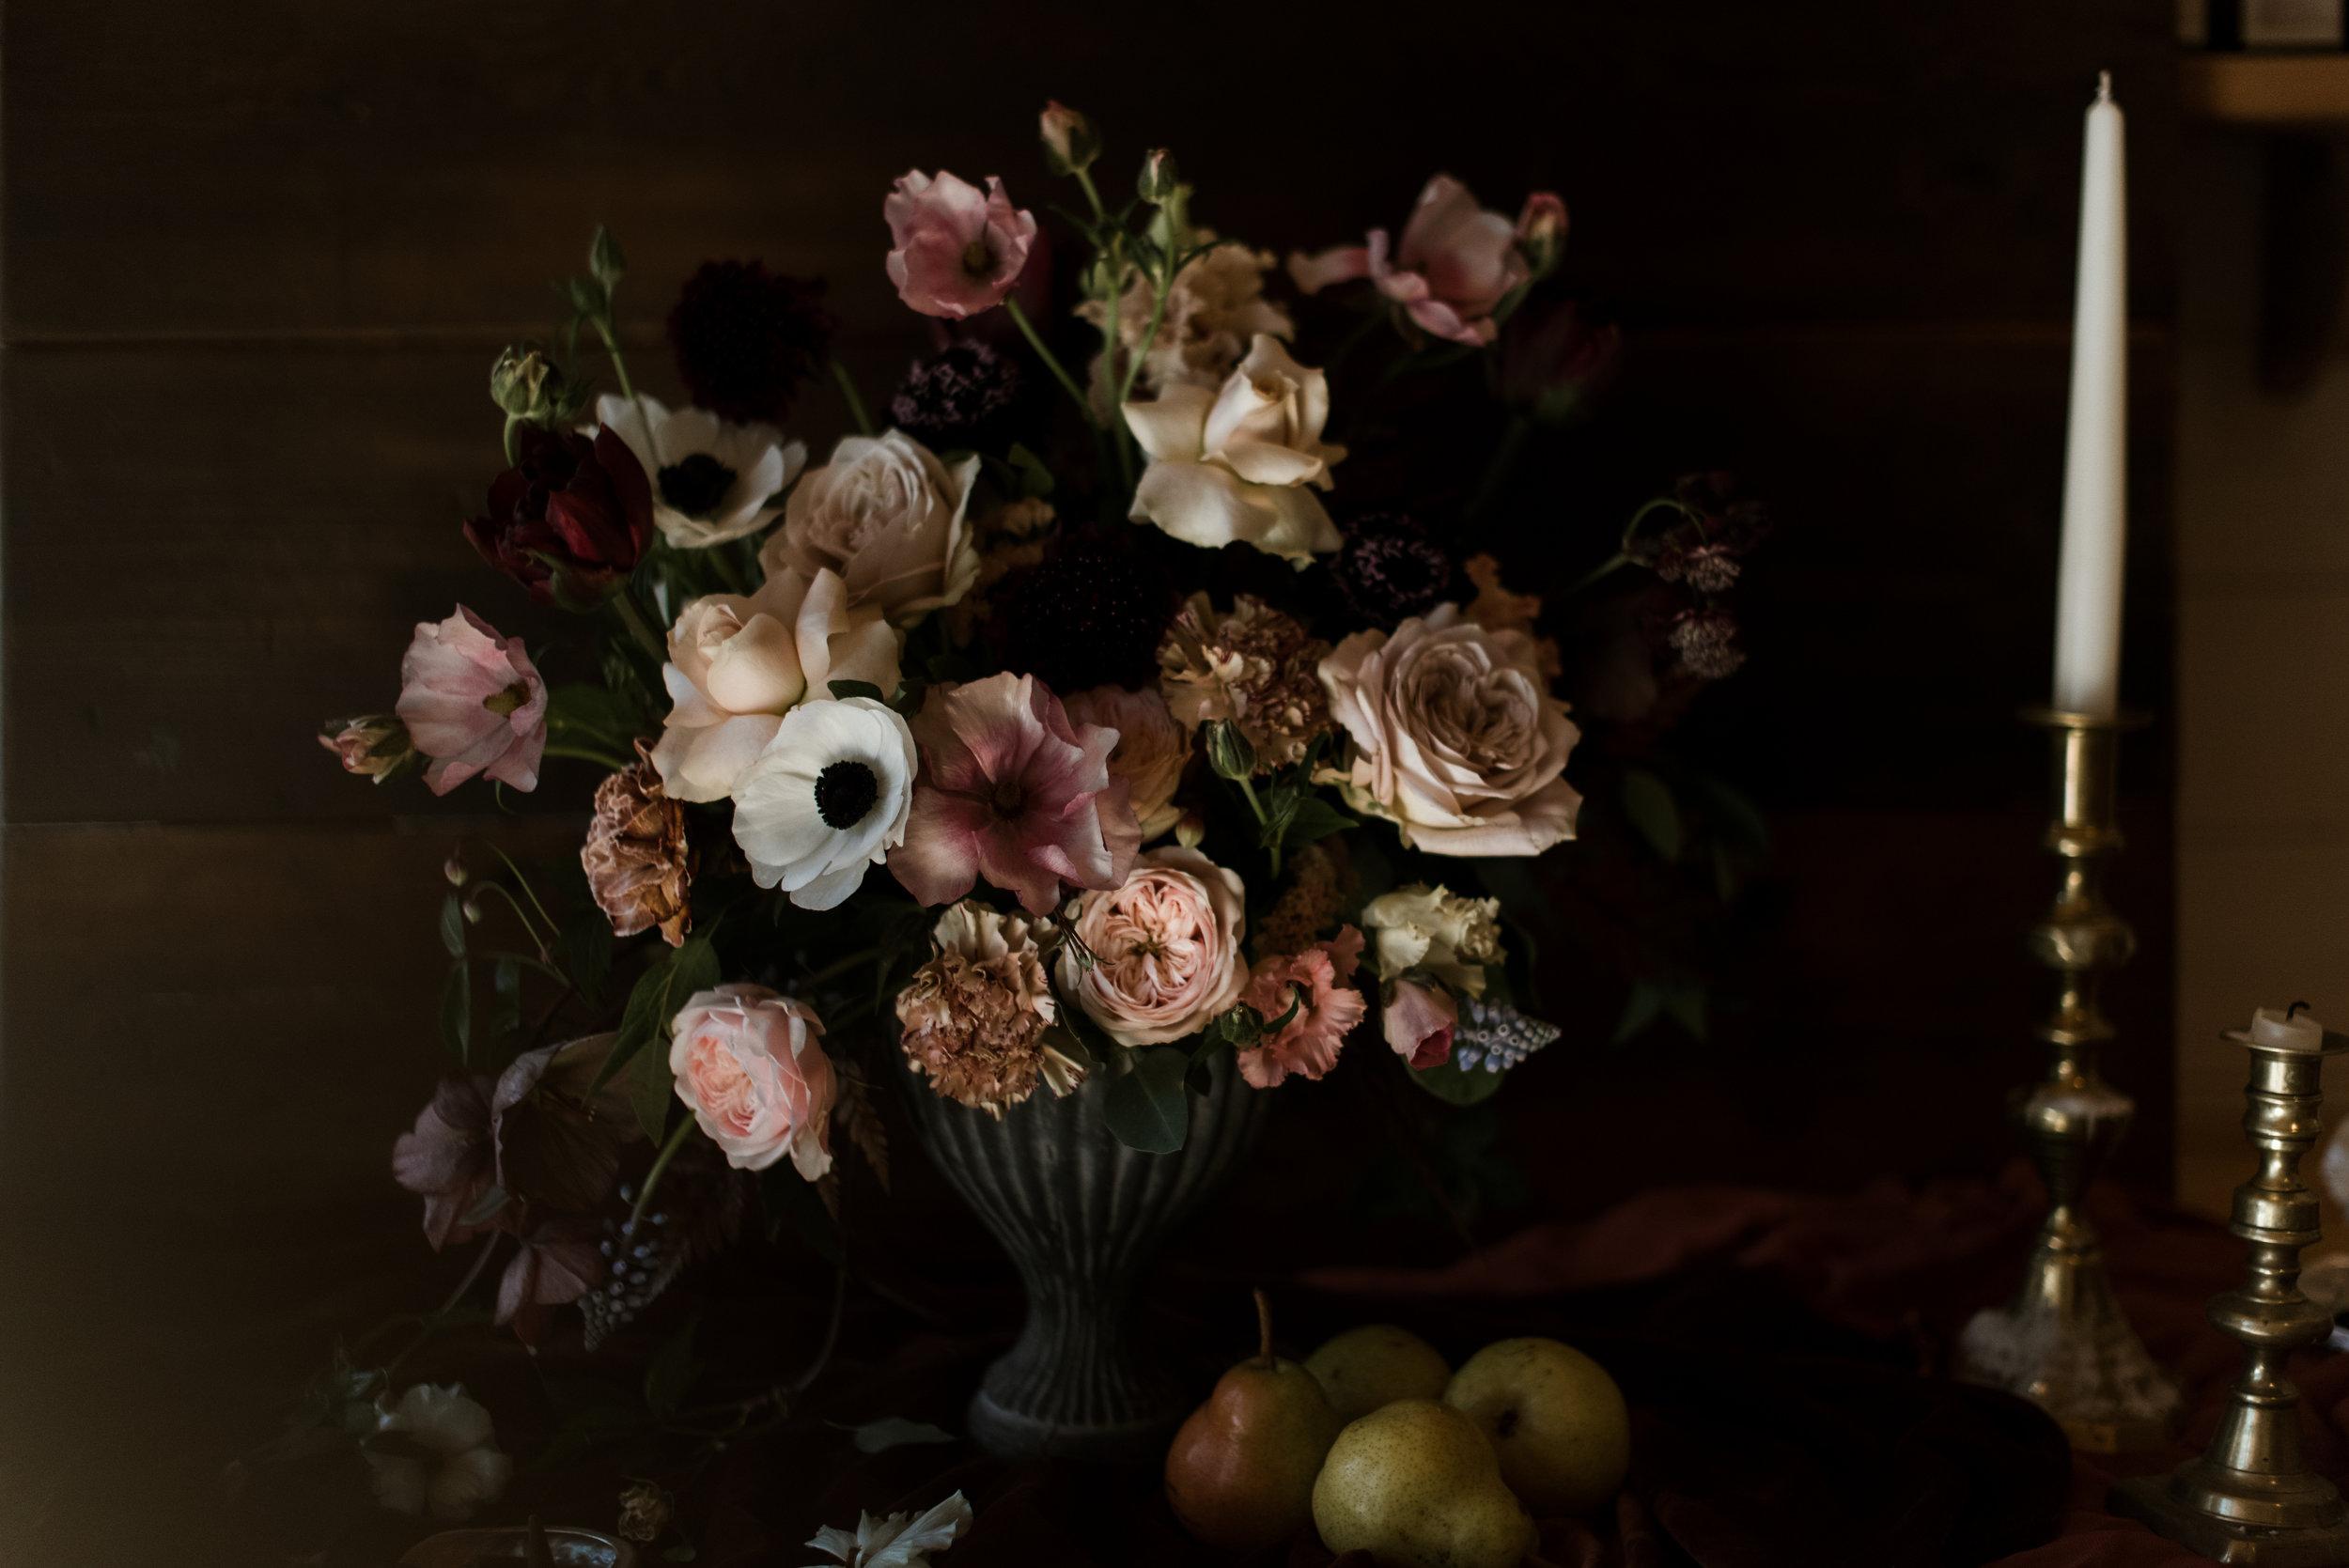 DarkRomance-GHphoto-3.jpg